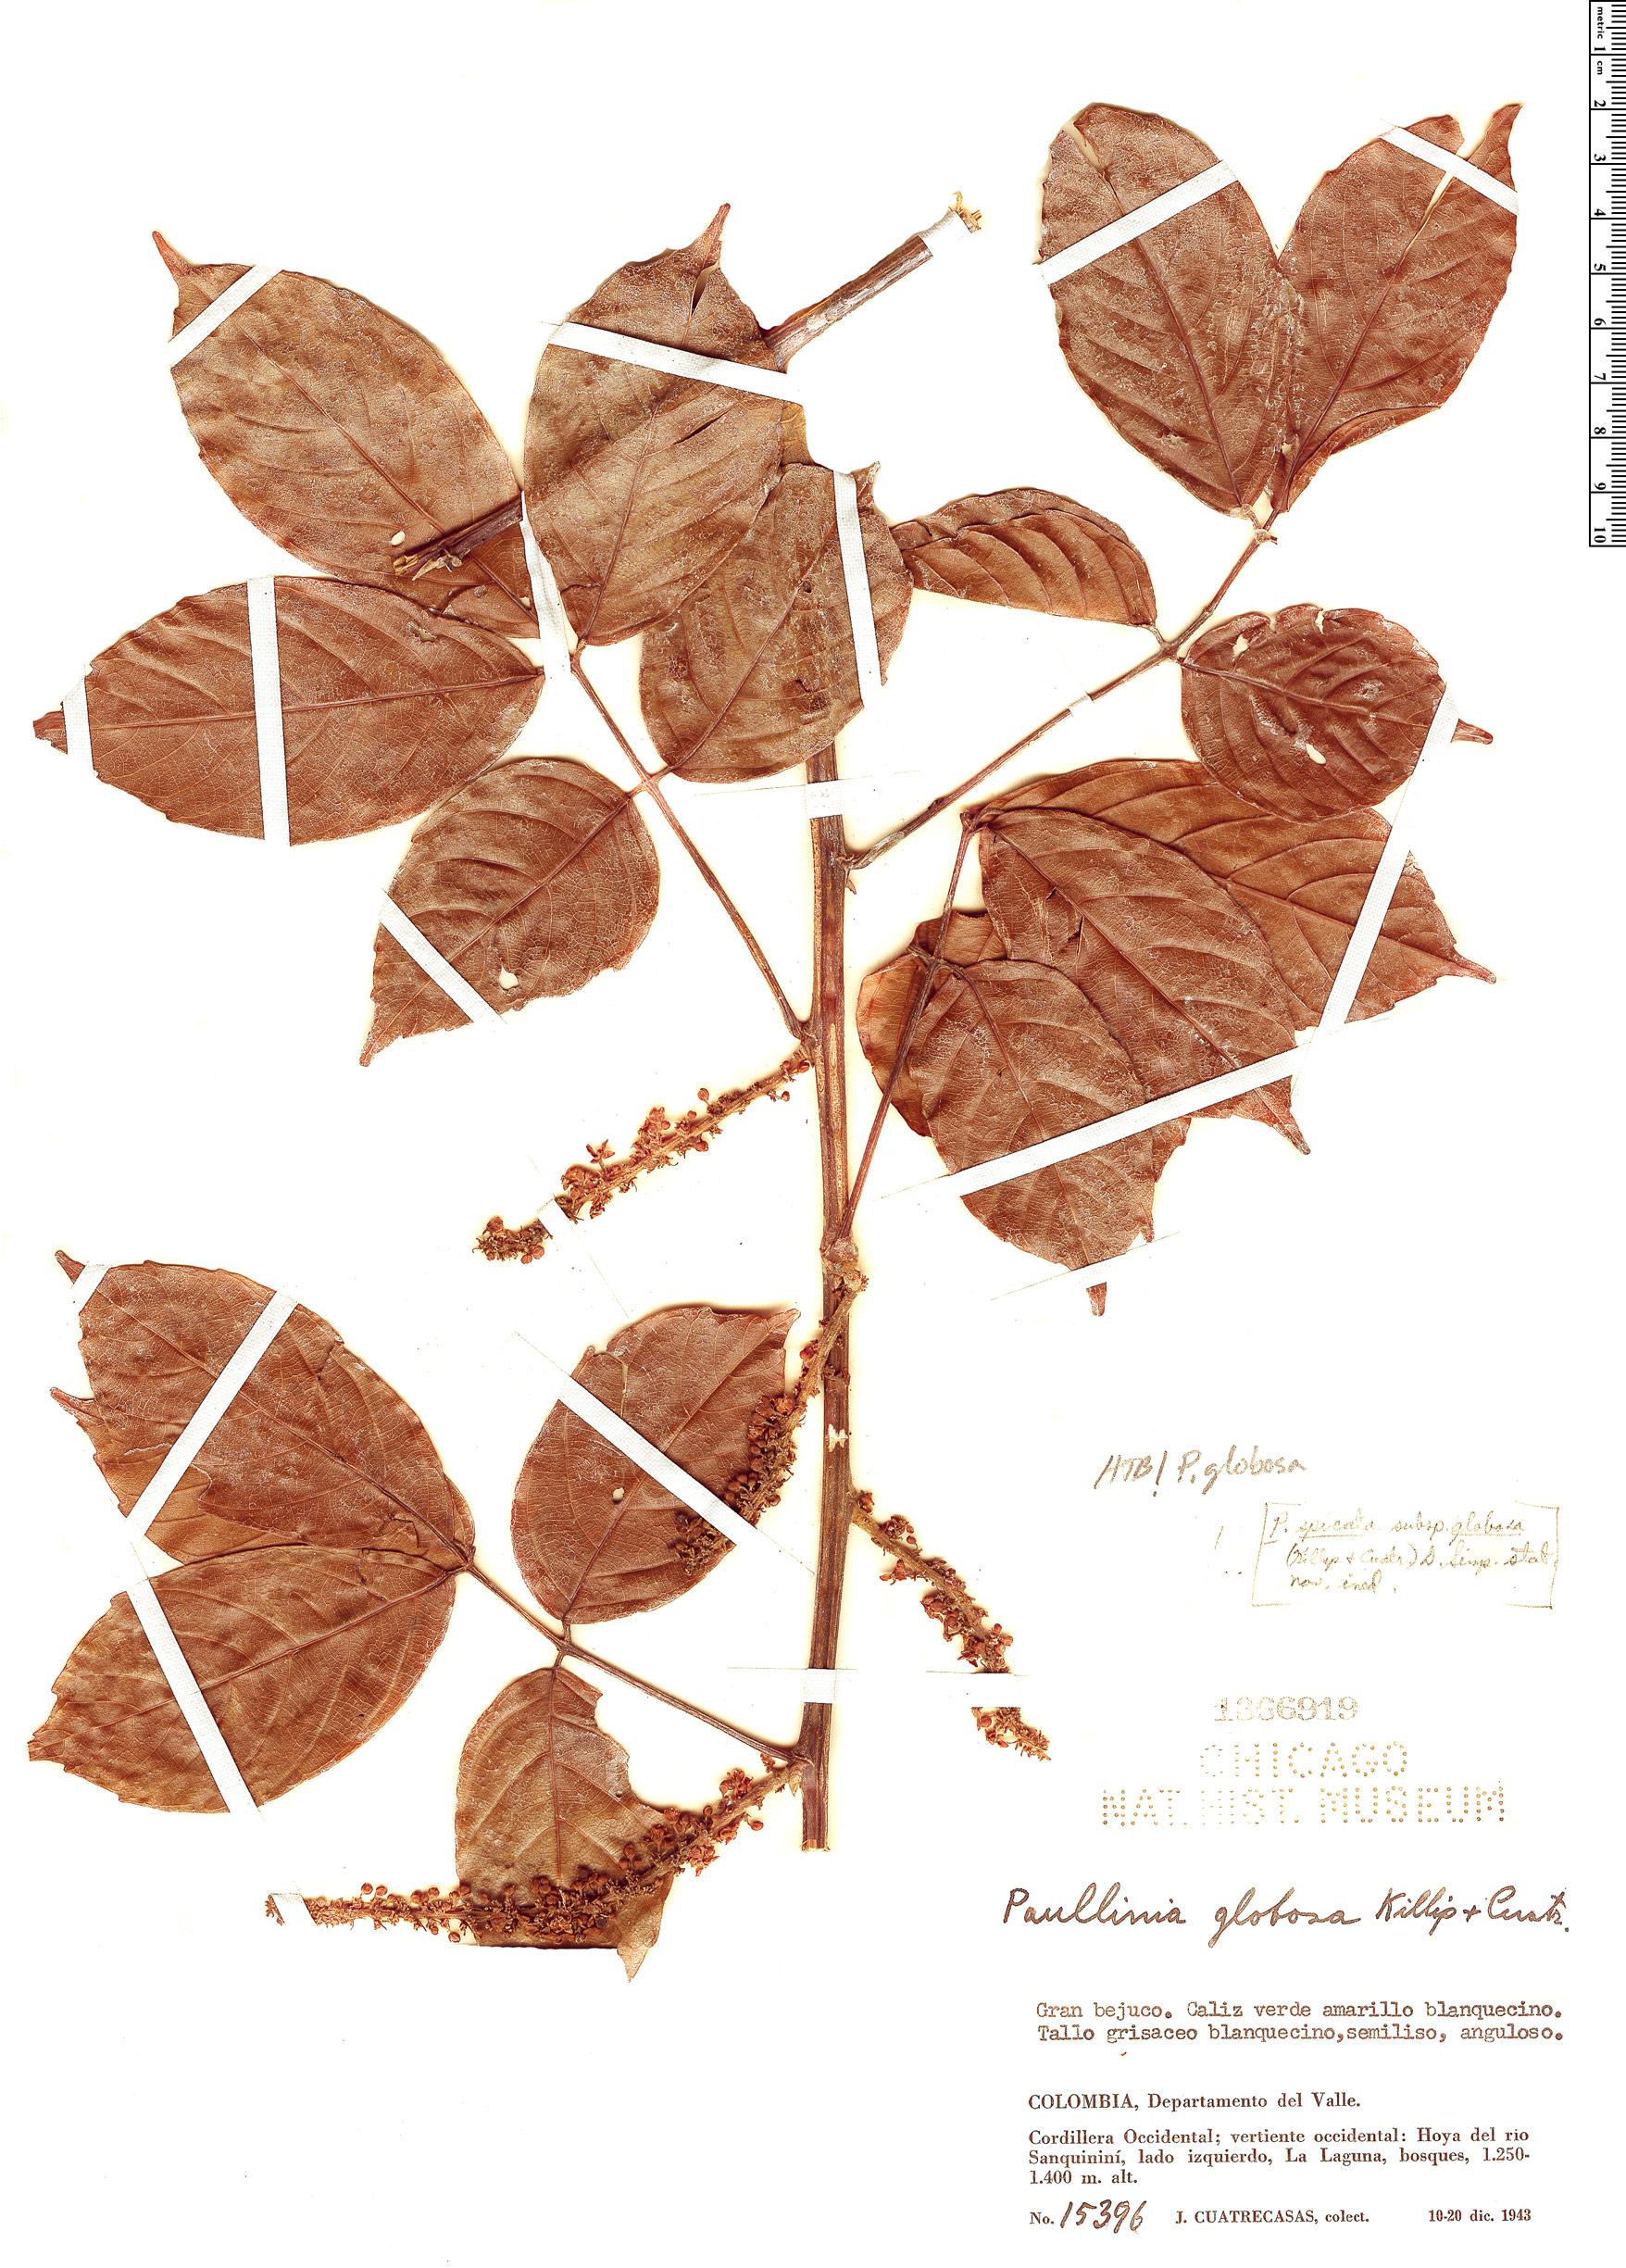 Specimen: Paullinia globosa